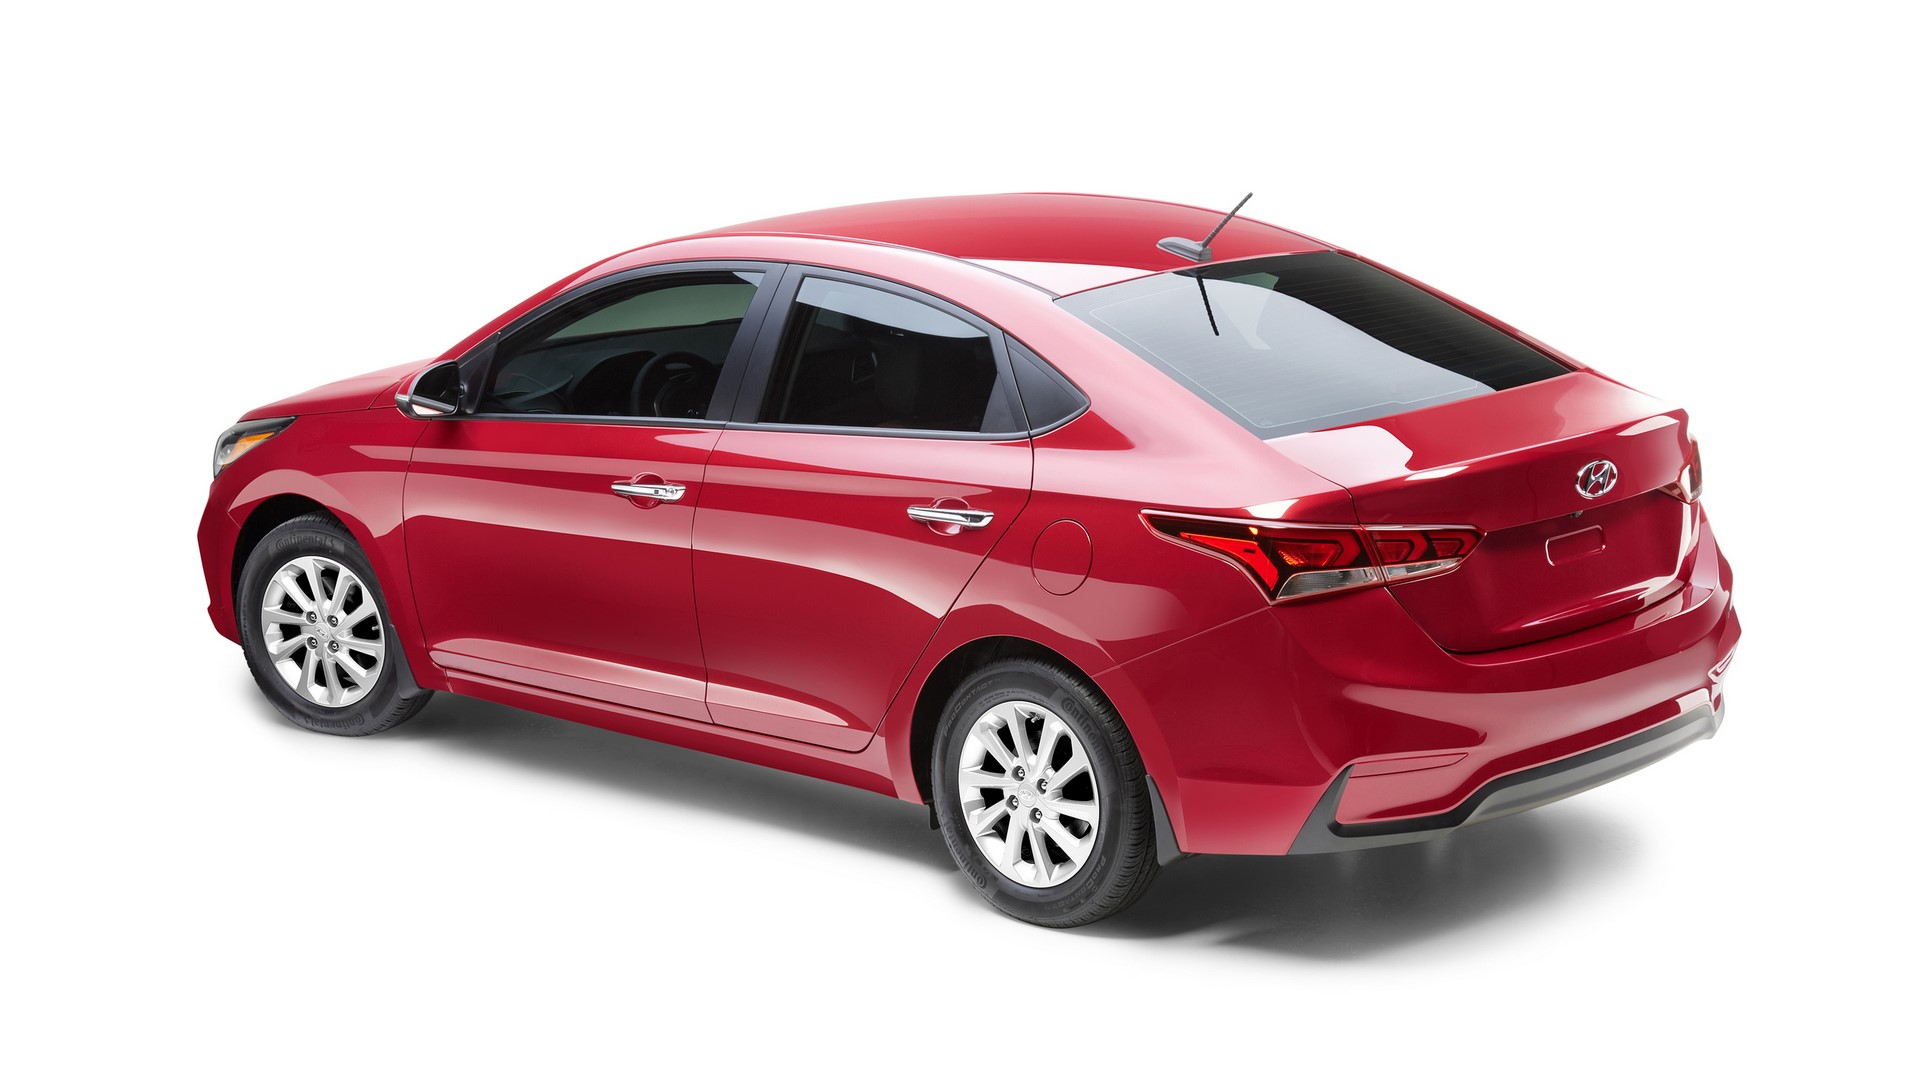 Hyundai Accent 2018 (7)